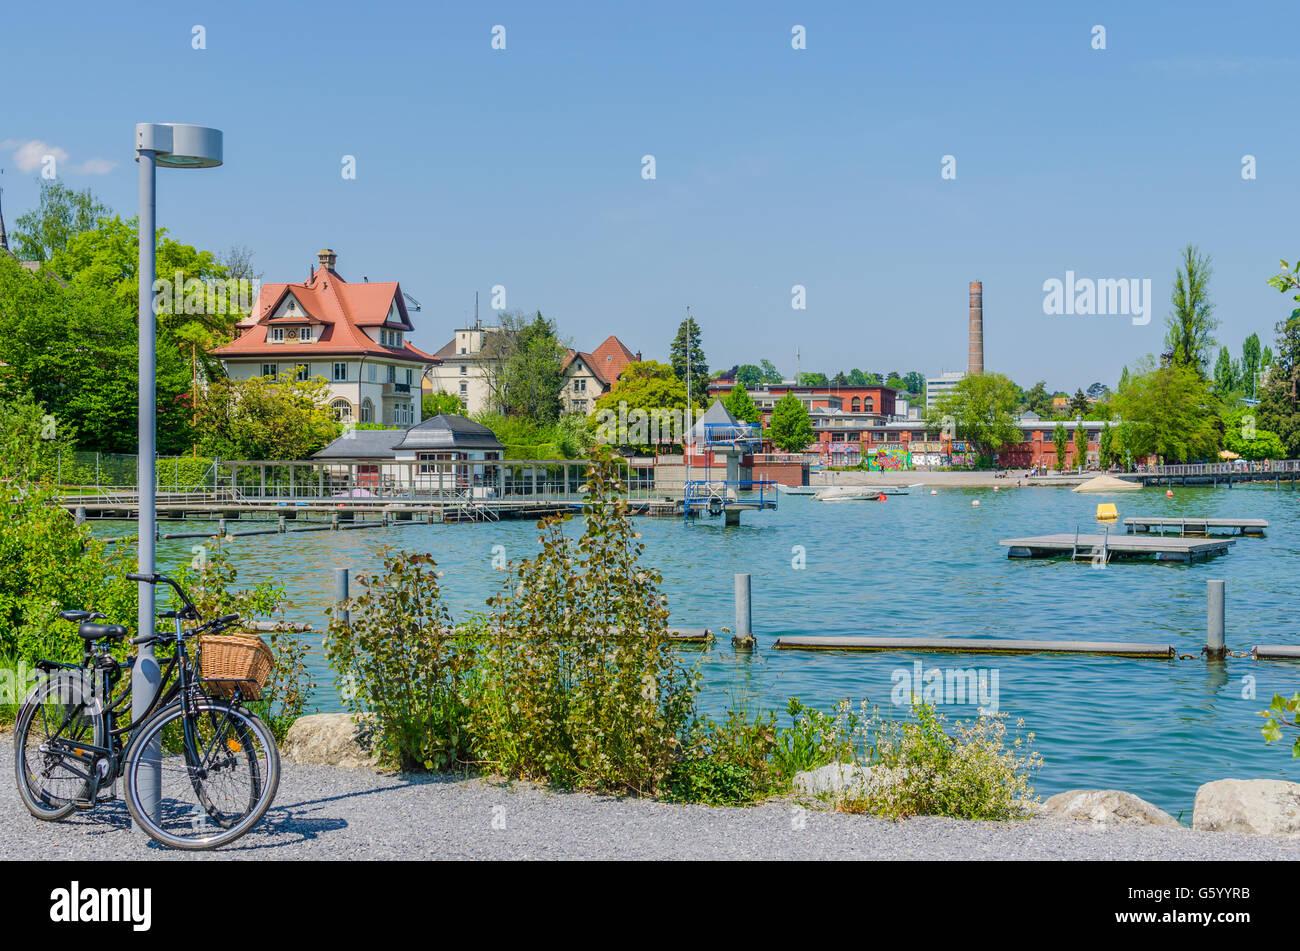 Strandbad Wollishofen on Zurichsee Stock Photo